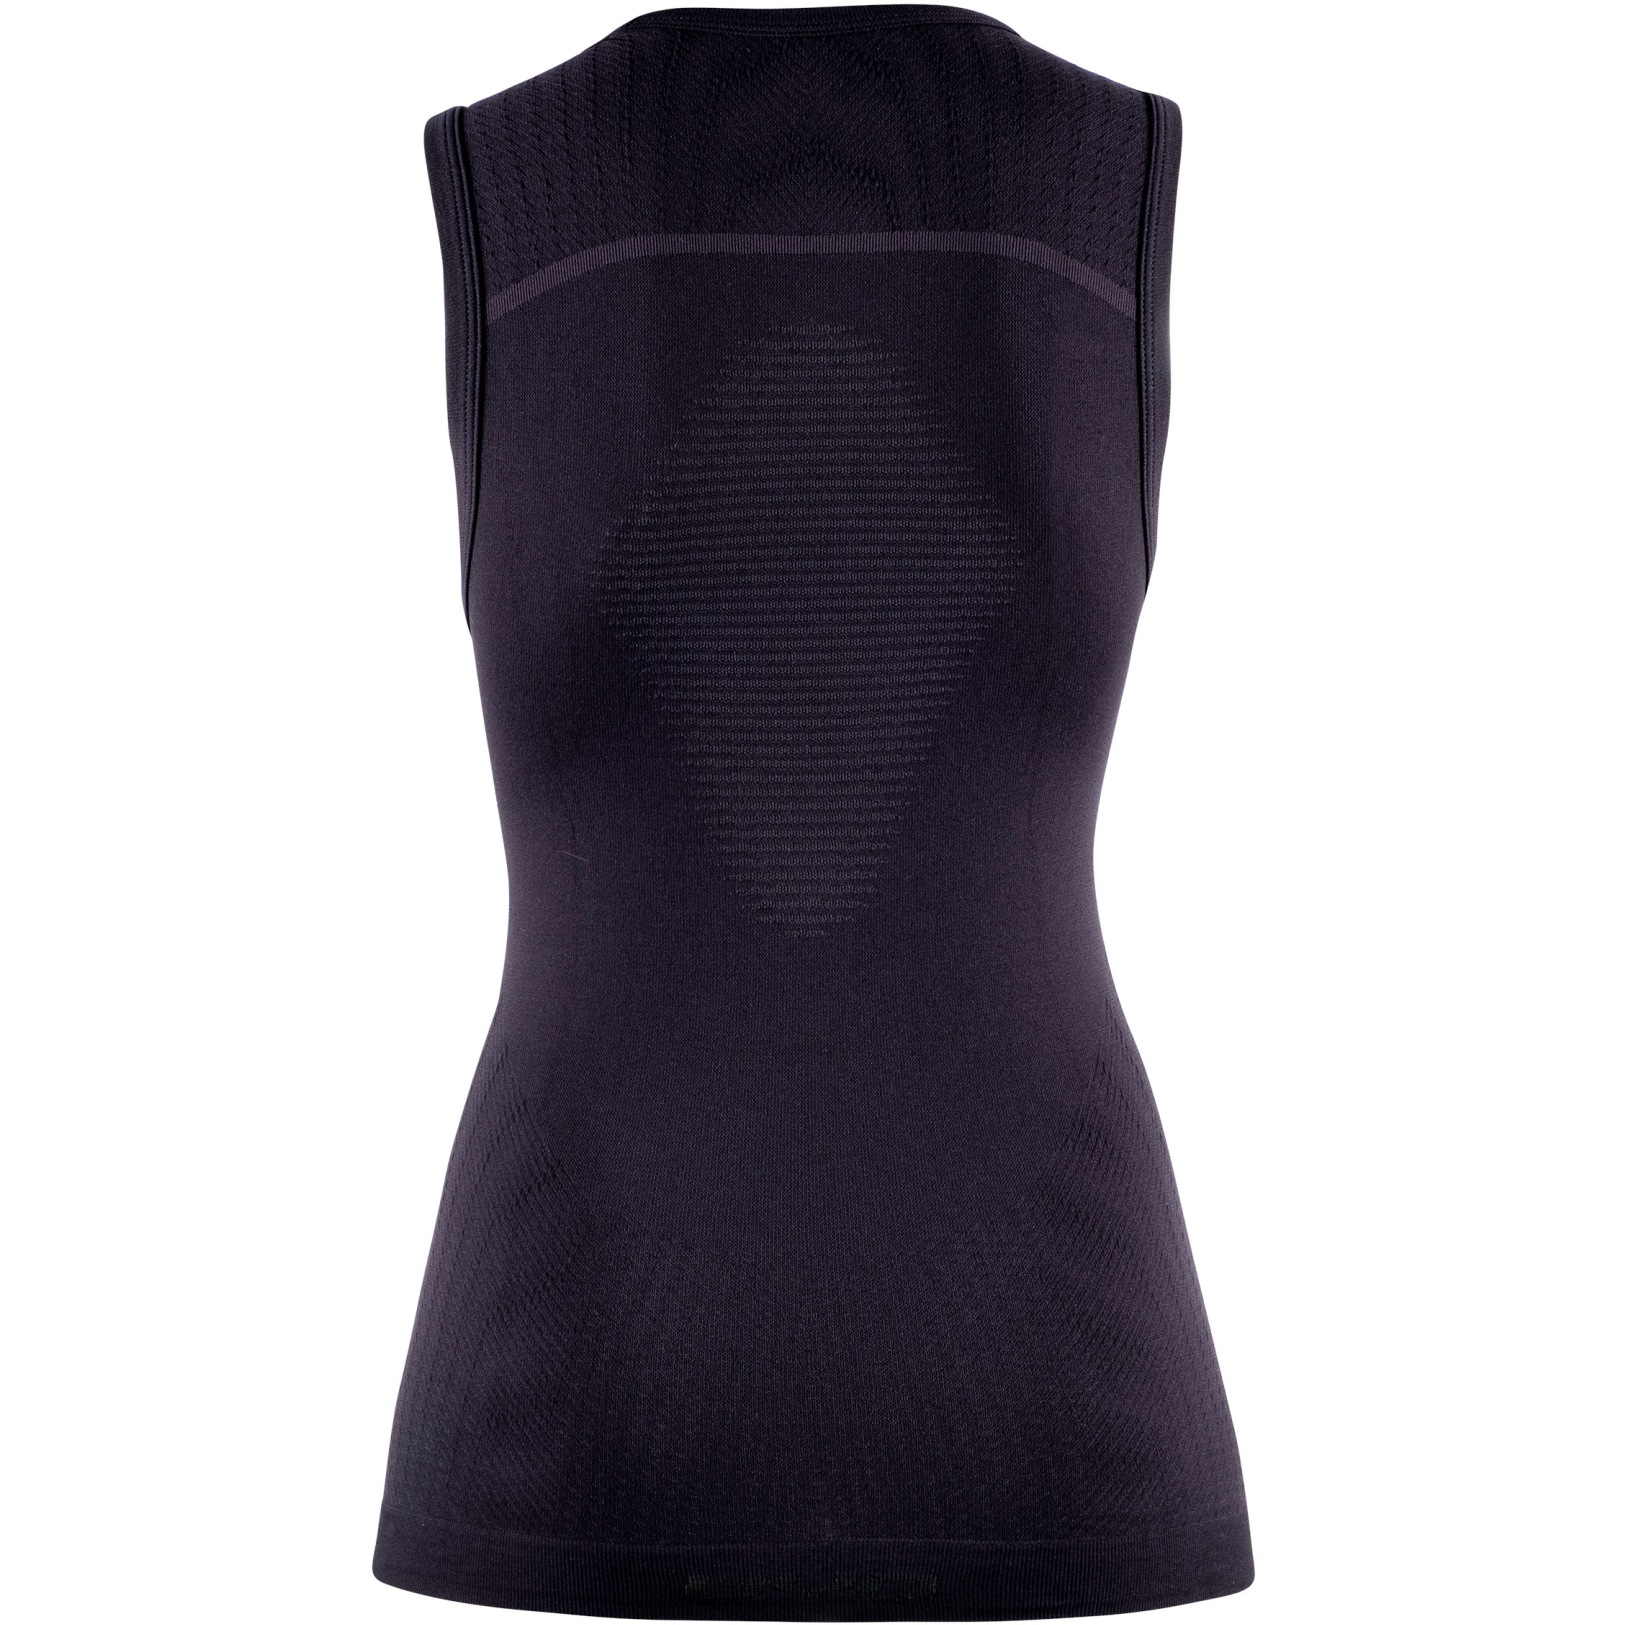 Bild von UYN Visyon Light 2.0 Underwear Ärmelloses Shirt Damen - Blackboard